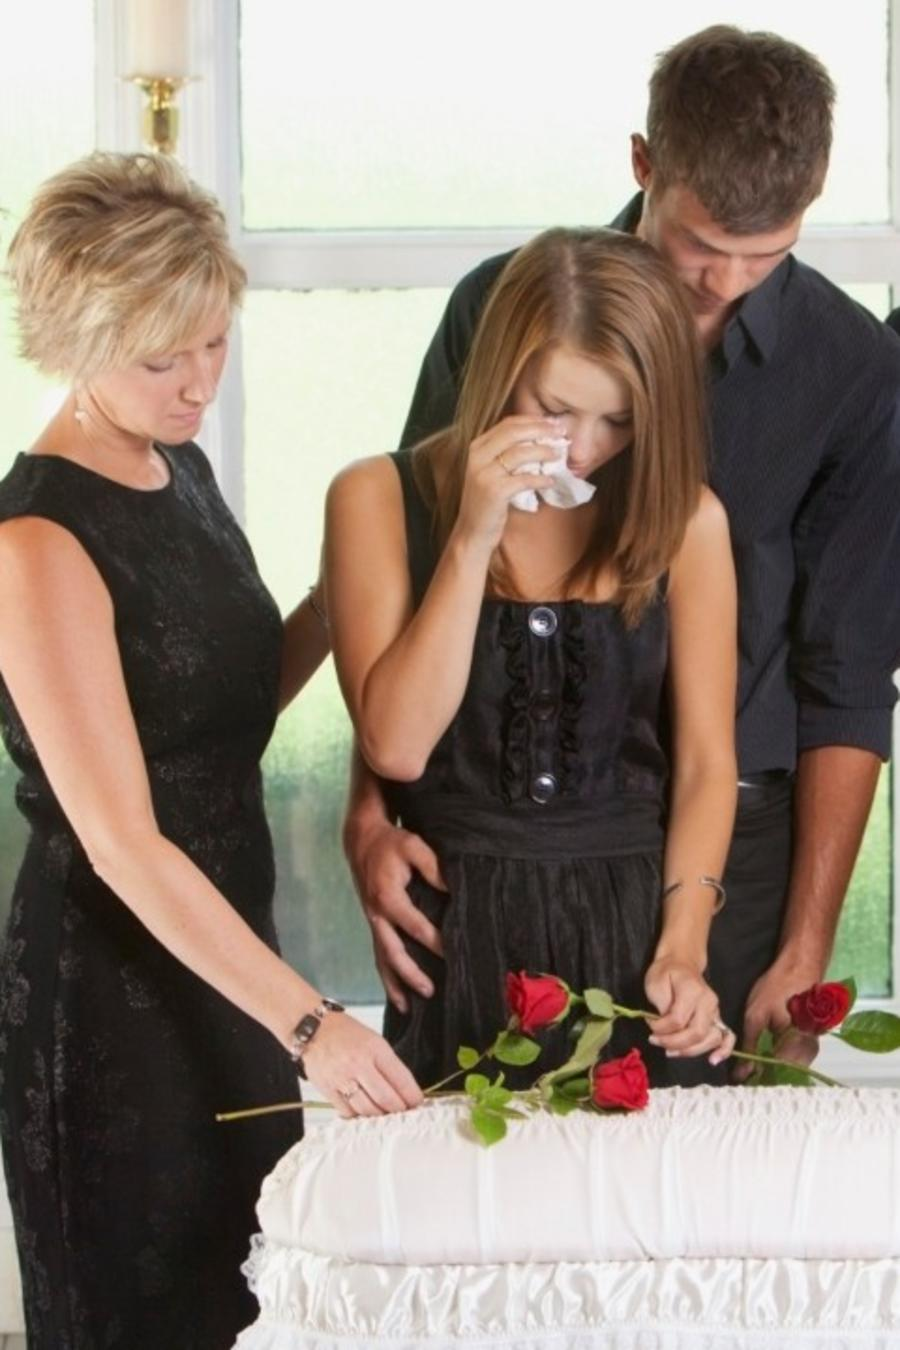 Familia en funeral de un bebé